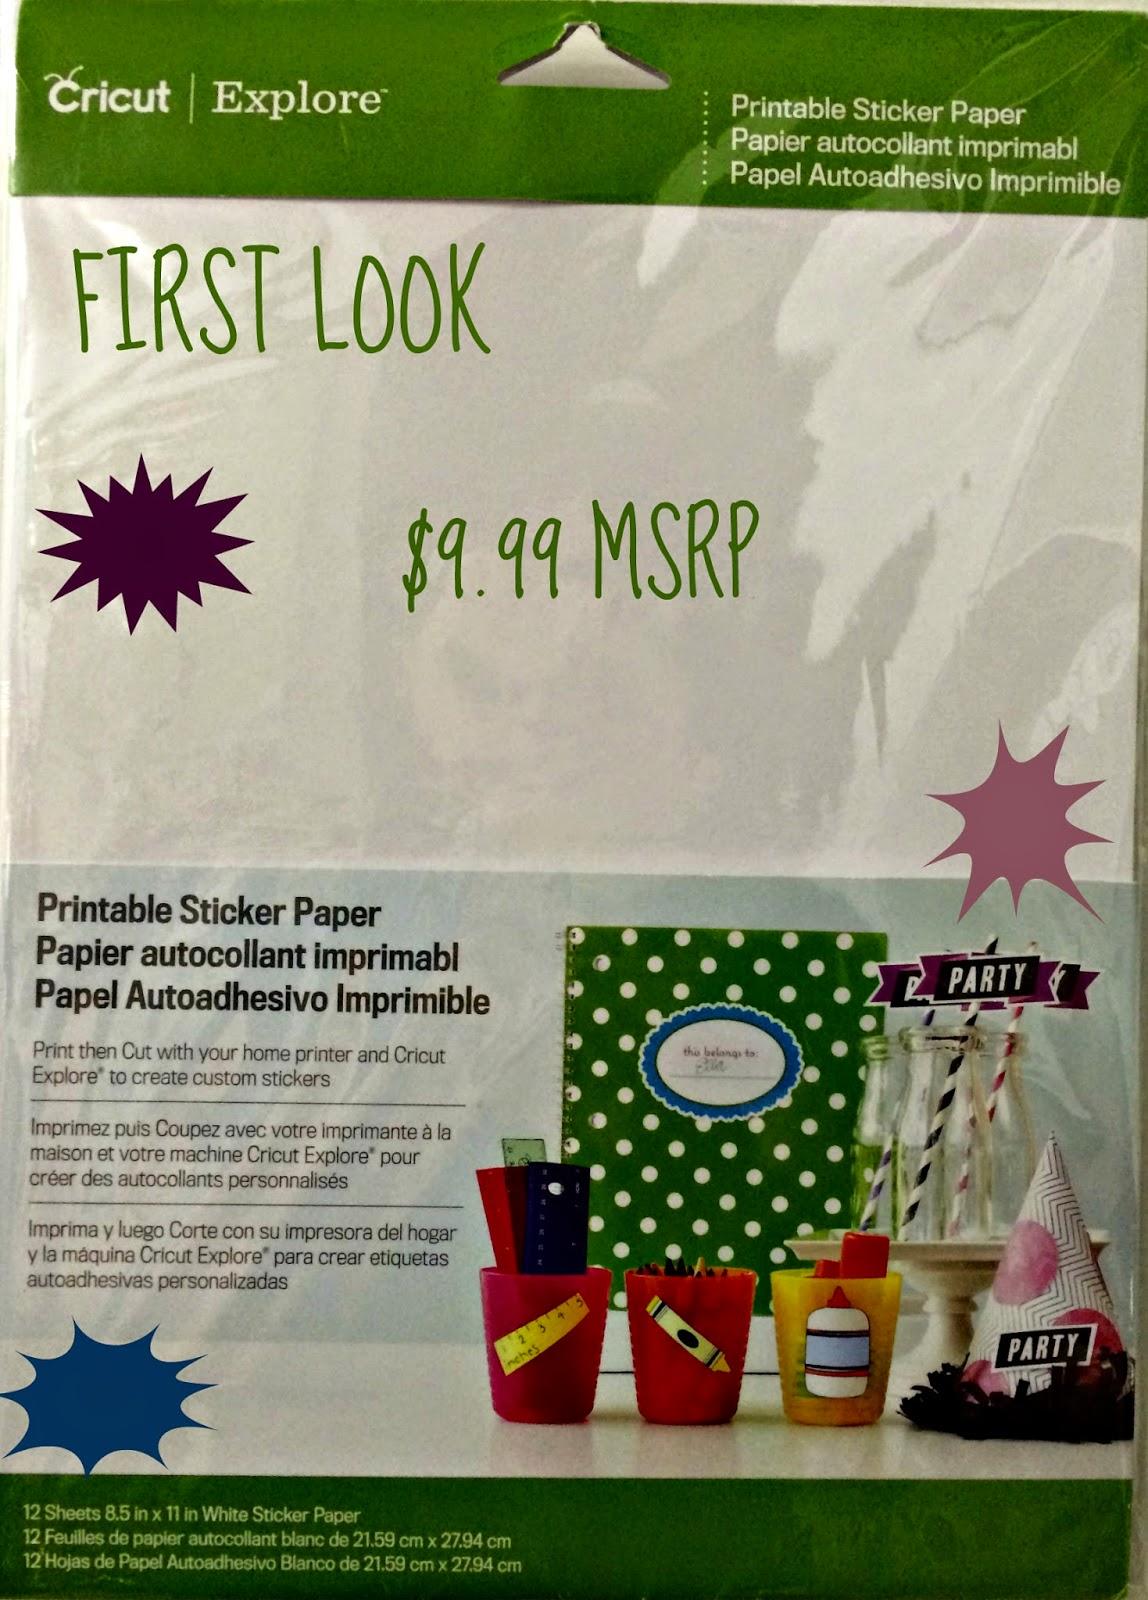 Epson Kitchen Printer Gas Ranges Cricut Print Then Cut - Printable Sticker Paper | Ken's ...